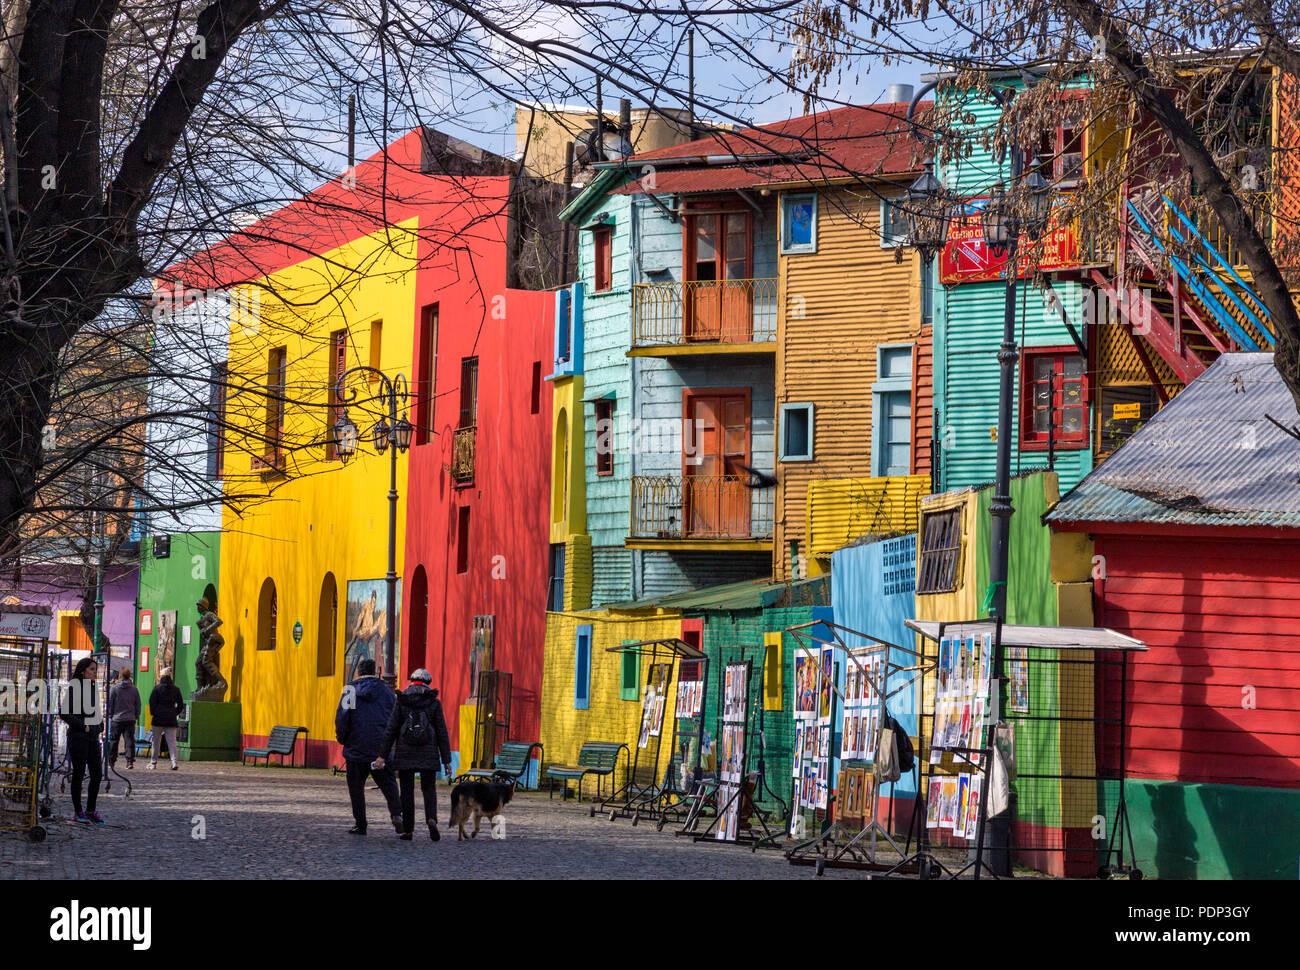 Caminito. La Boca, Buenos Aires, Argentina - Stock Image